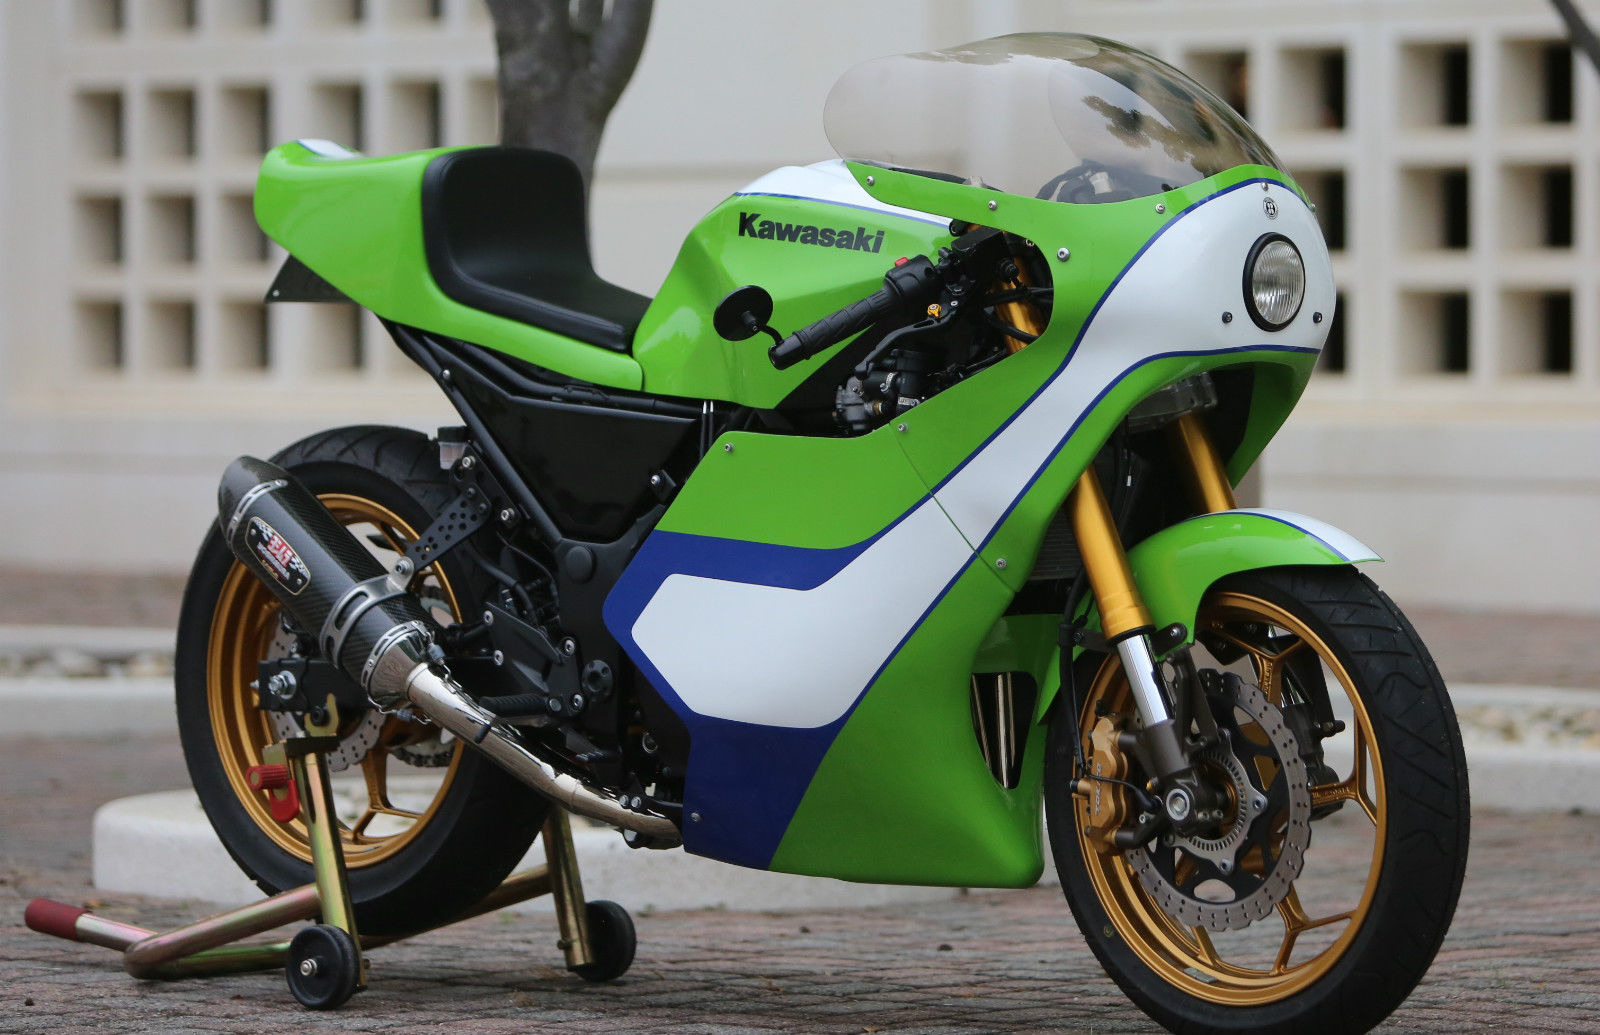 kawasaki 300 ninja - h2 gary nixon race bike replica | 99garage